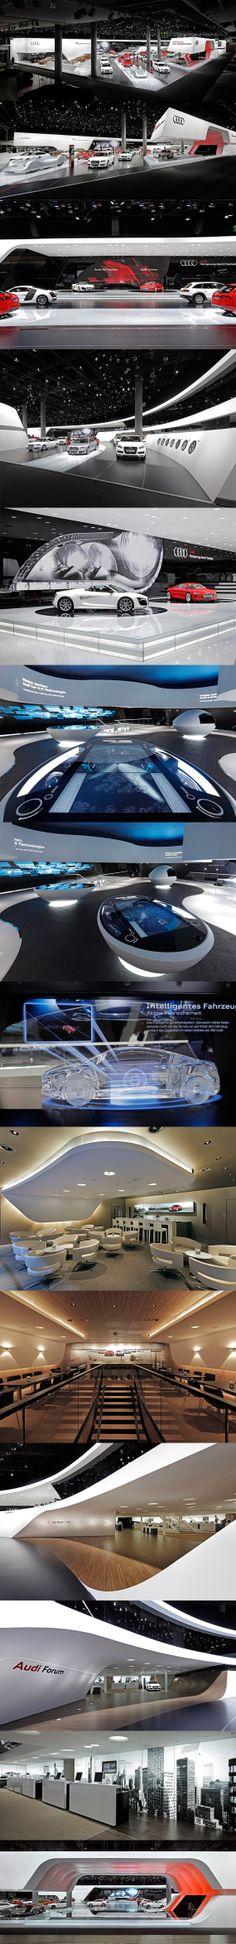 Audi...as usual UBER impressive exhibits! http://msc.prosite.com